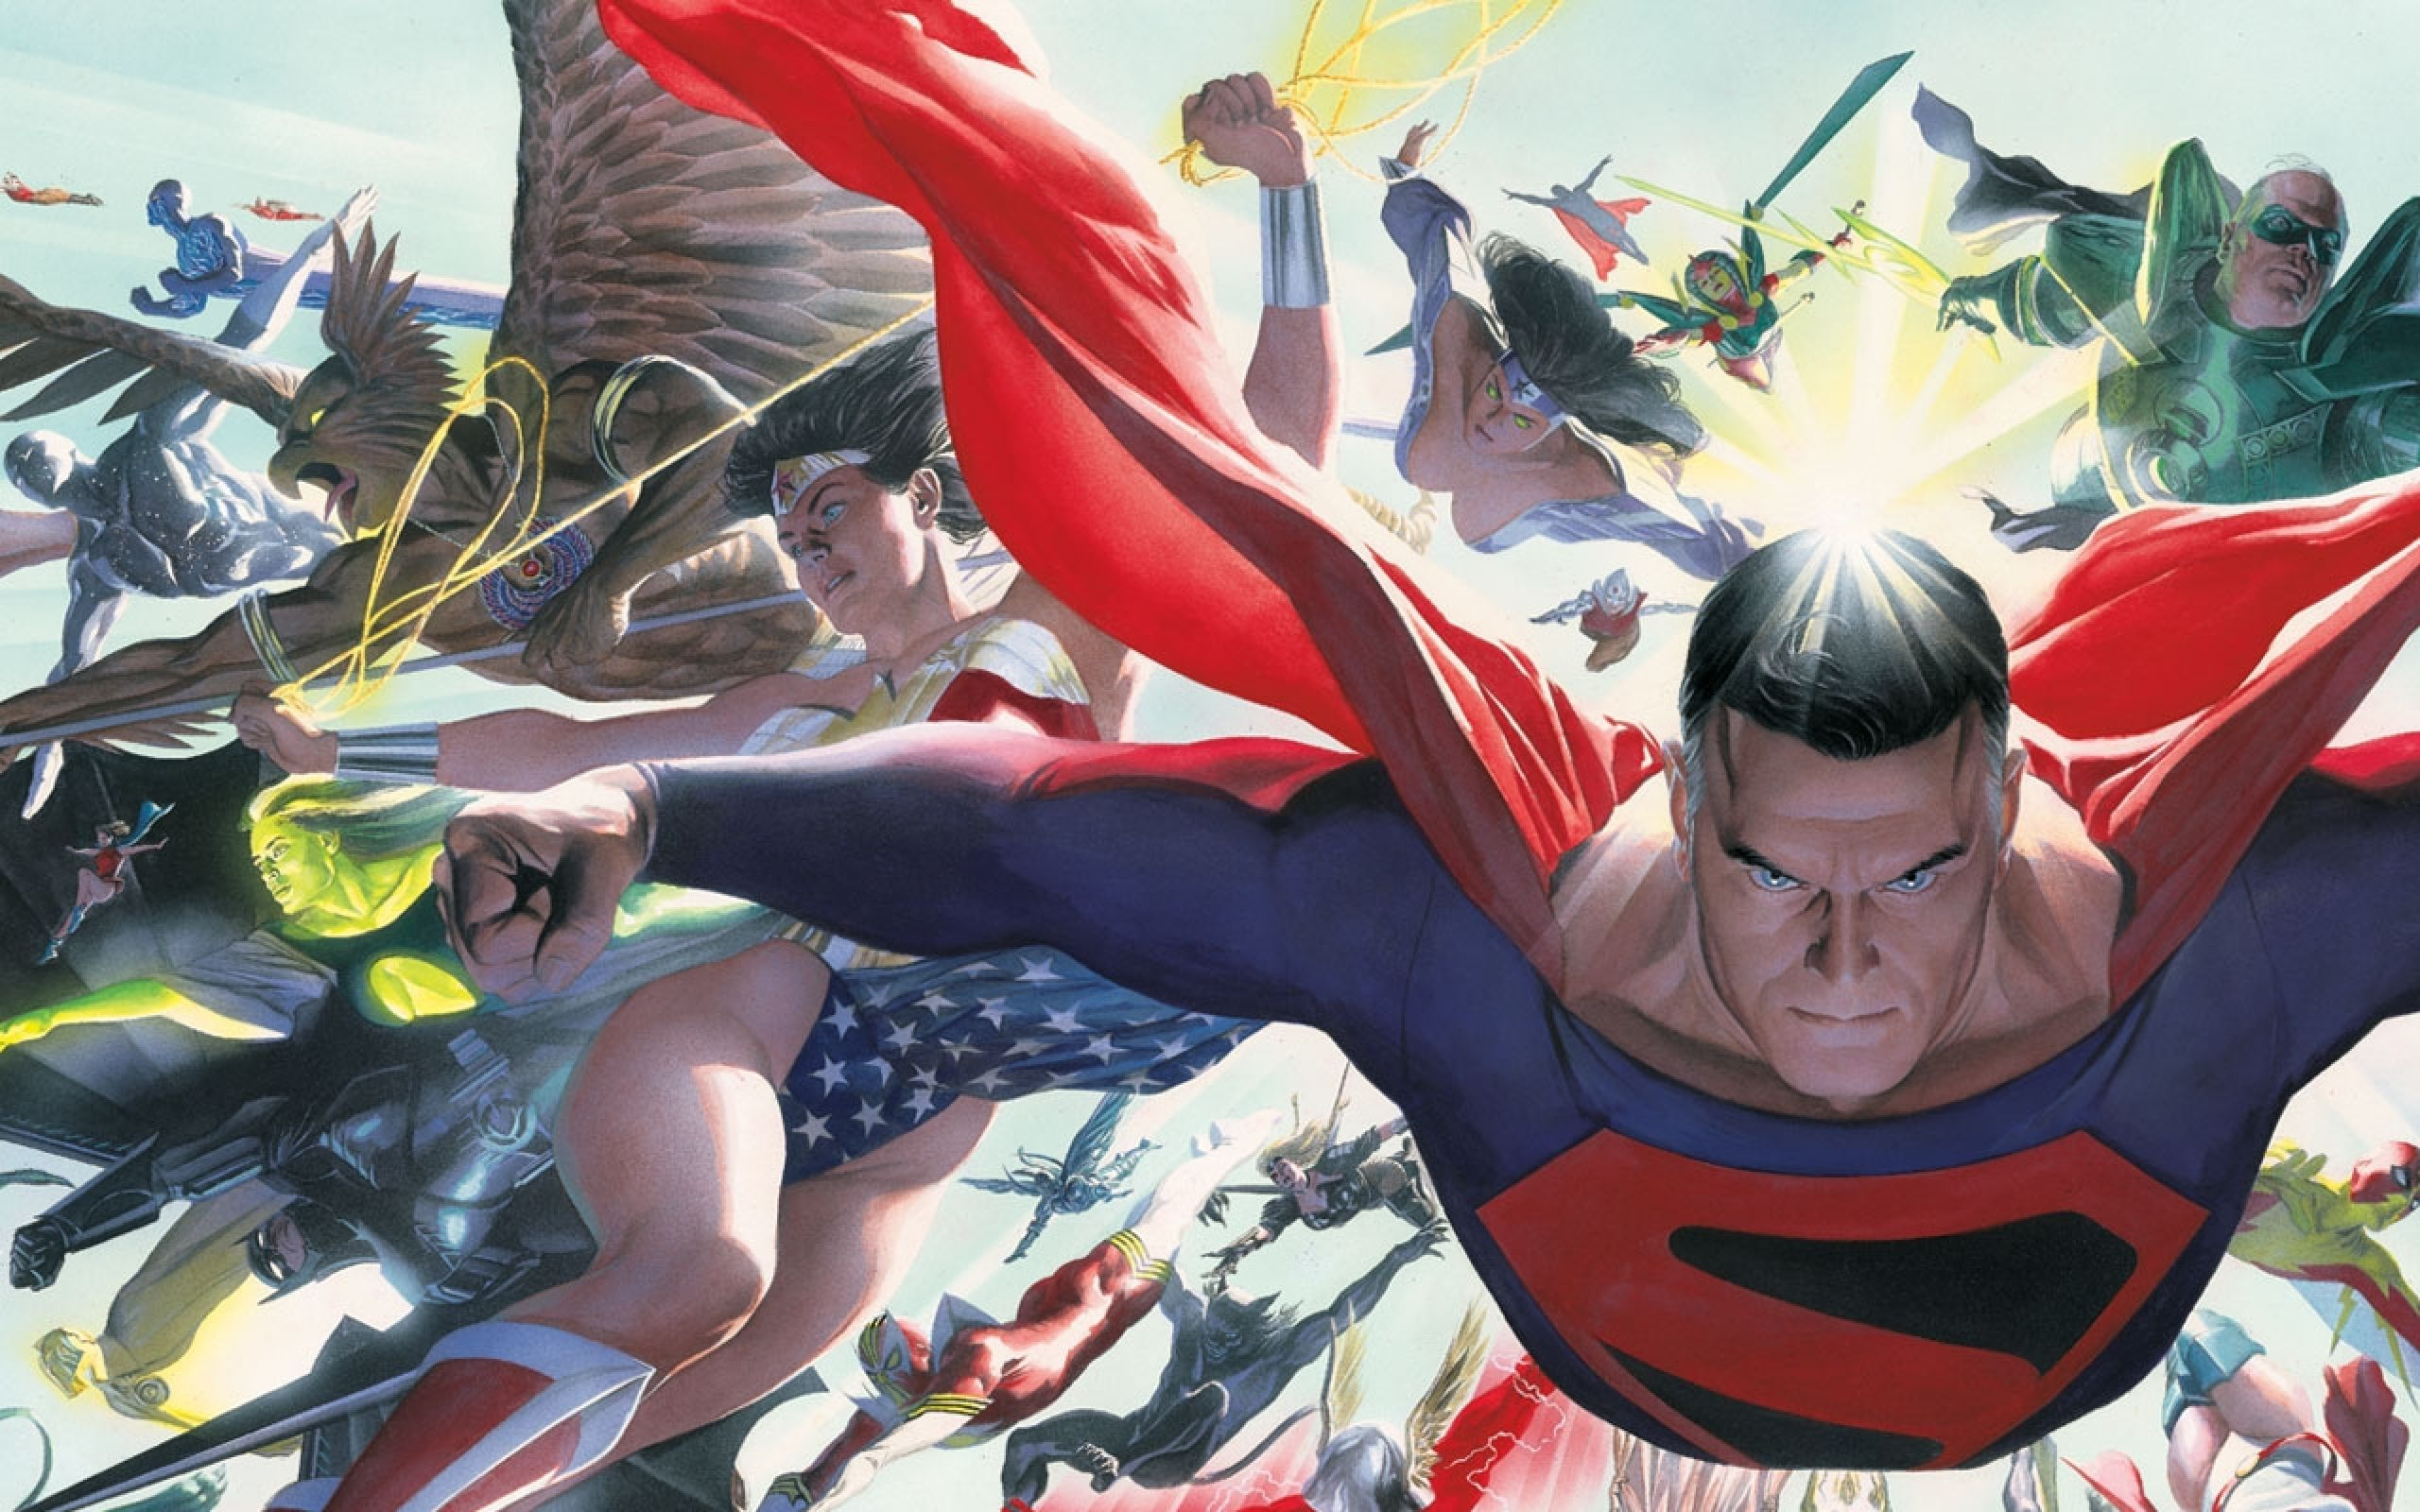 Green Lantern Batman Superman Alex Ross Kingdom Come Wonder Woman